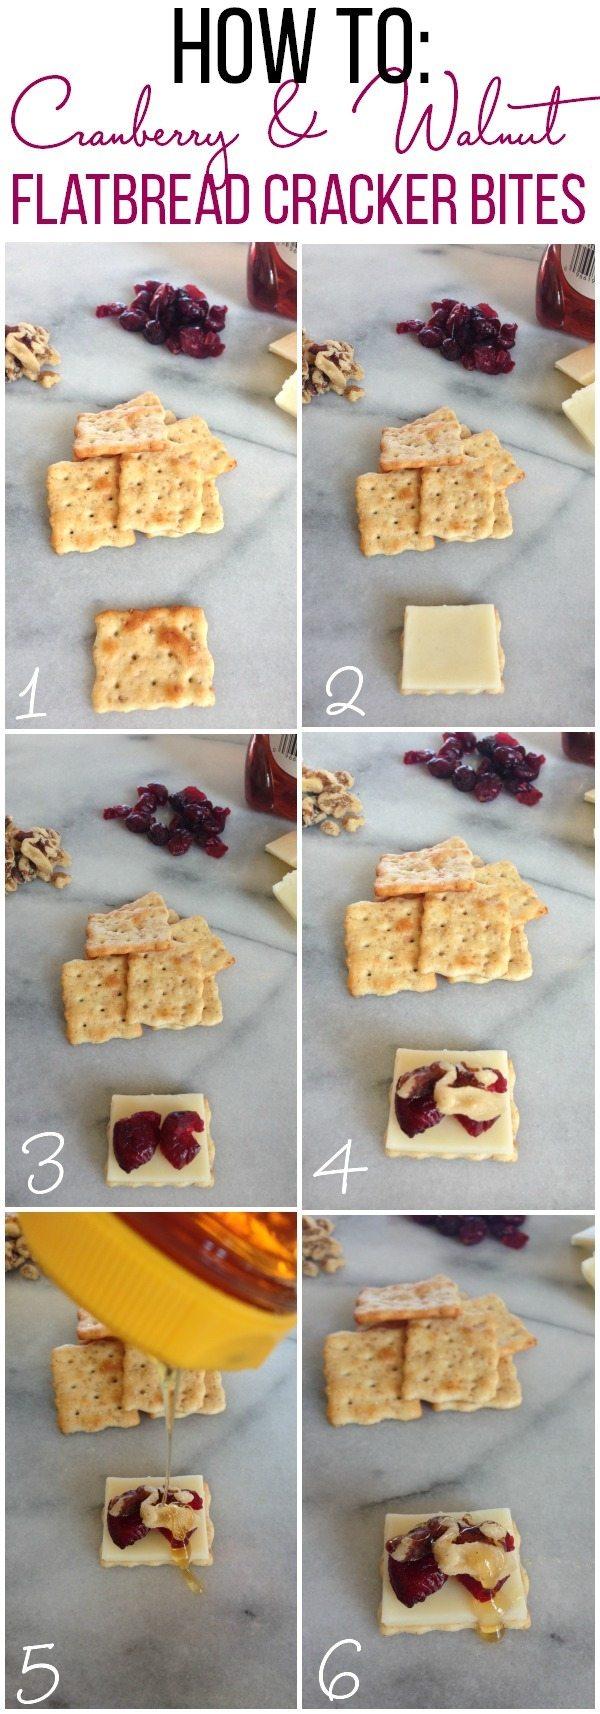 How to make Flatbread Cracker Bites